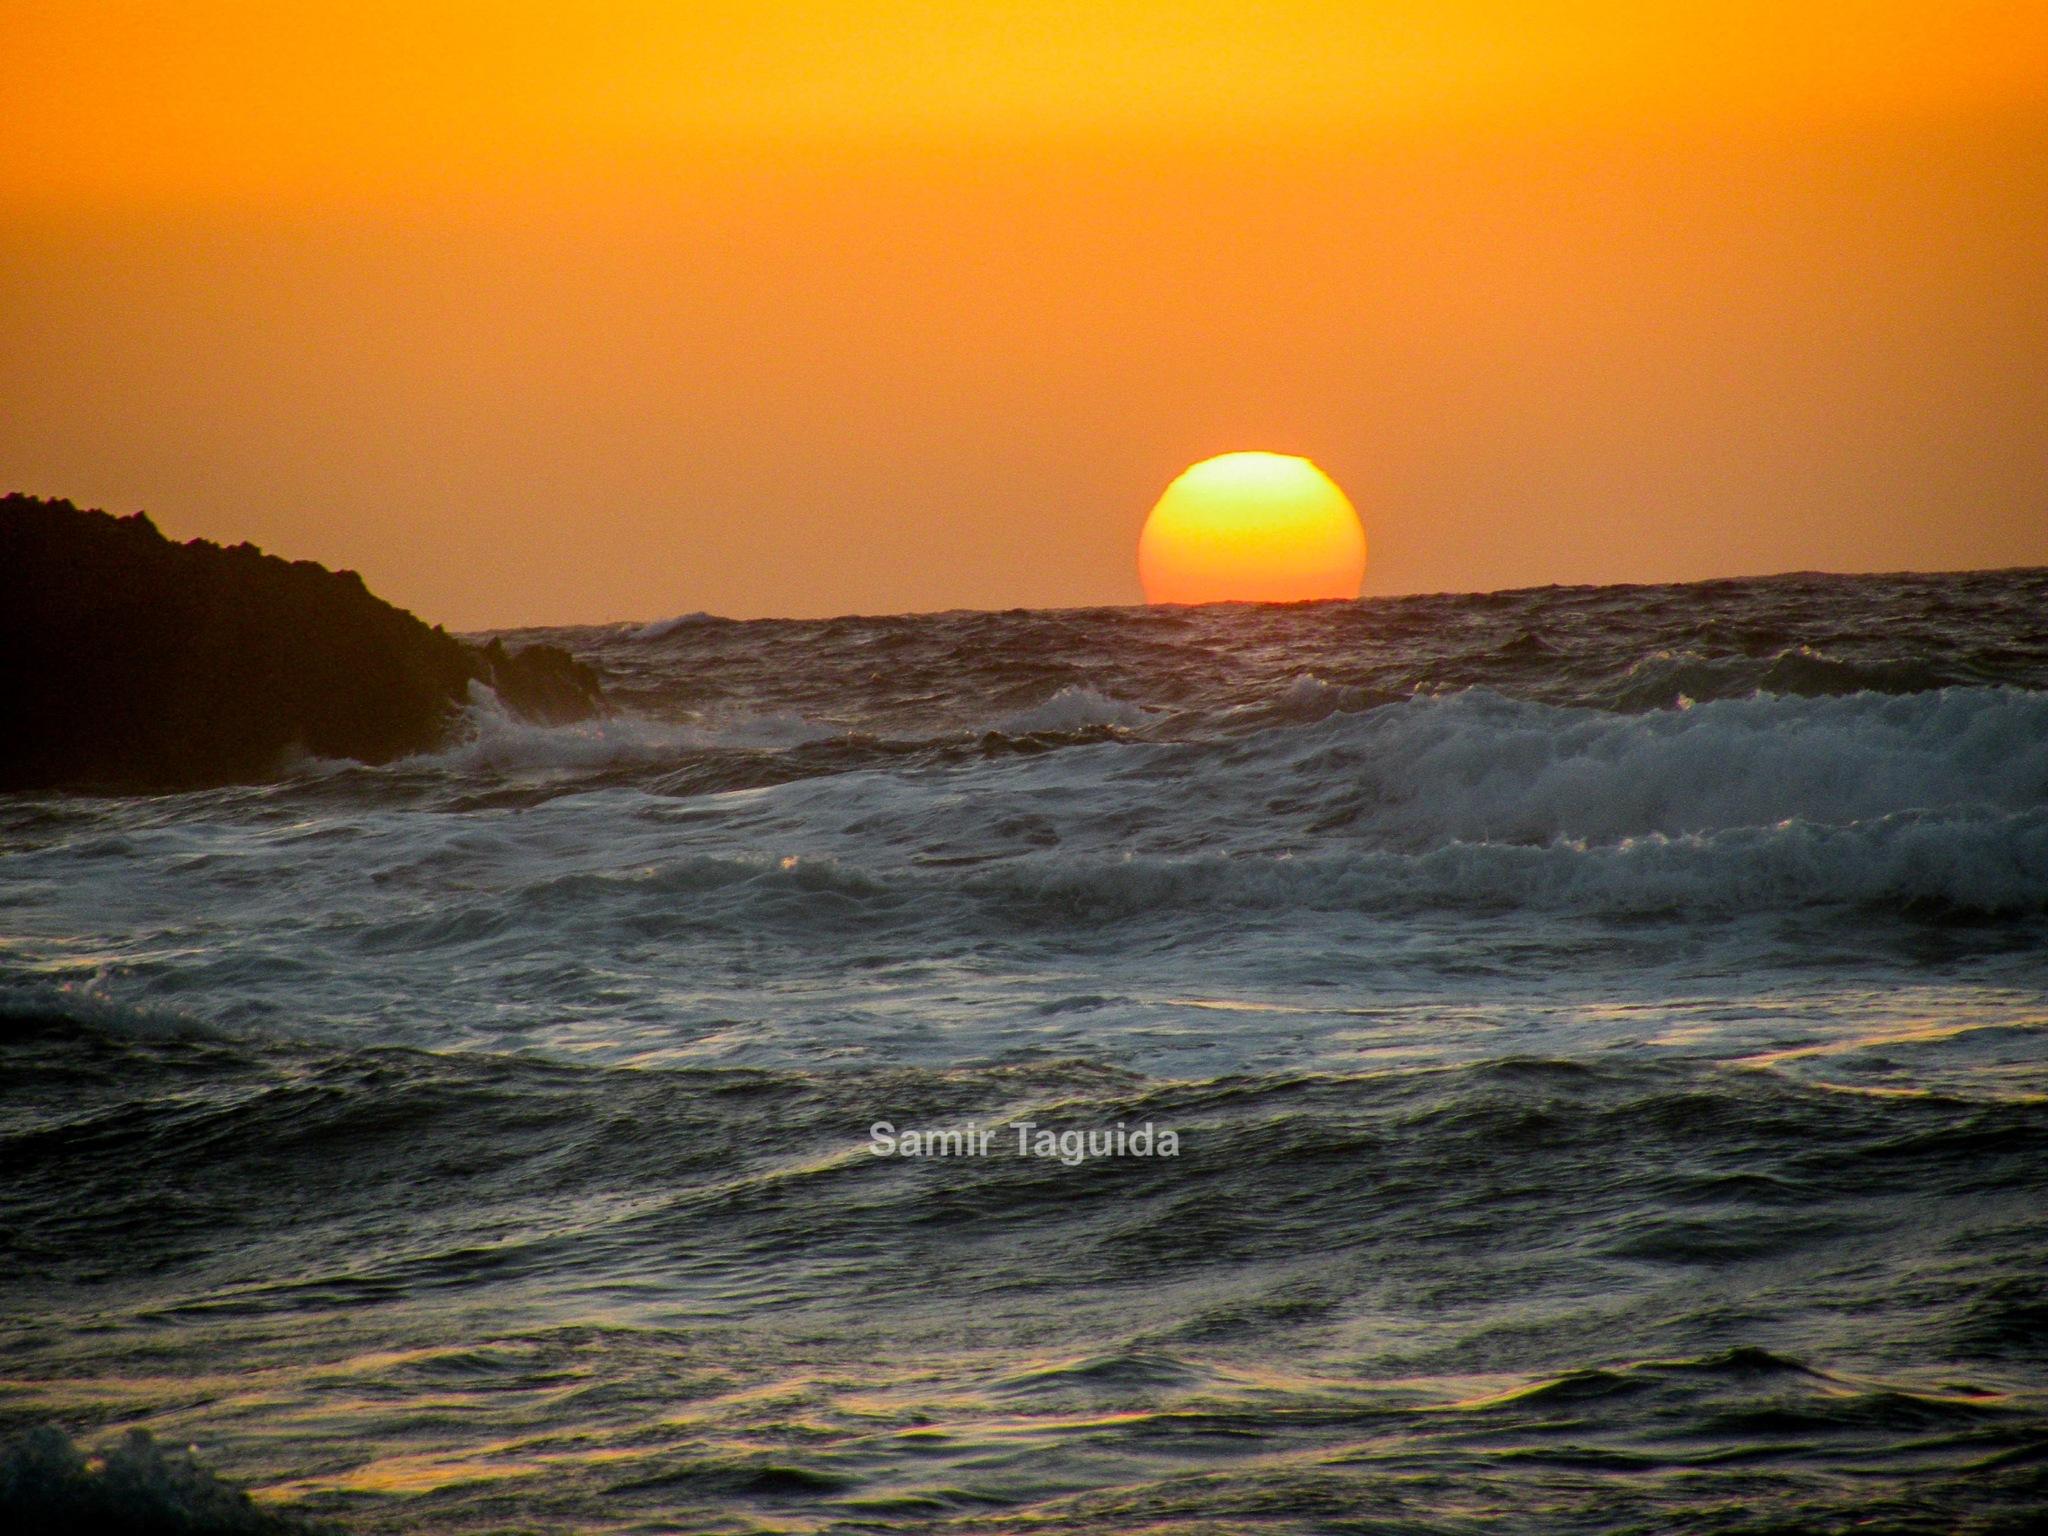 sunset by Samir Taguida